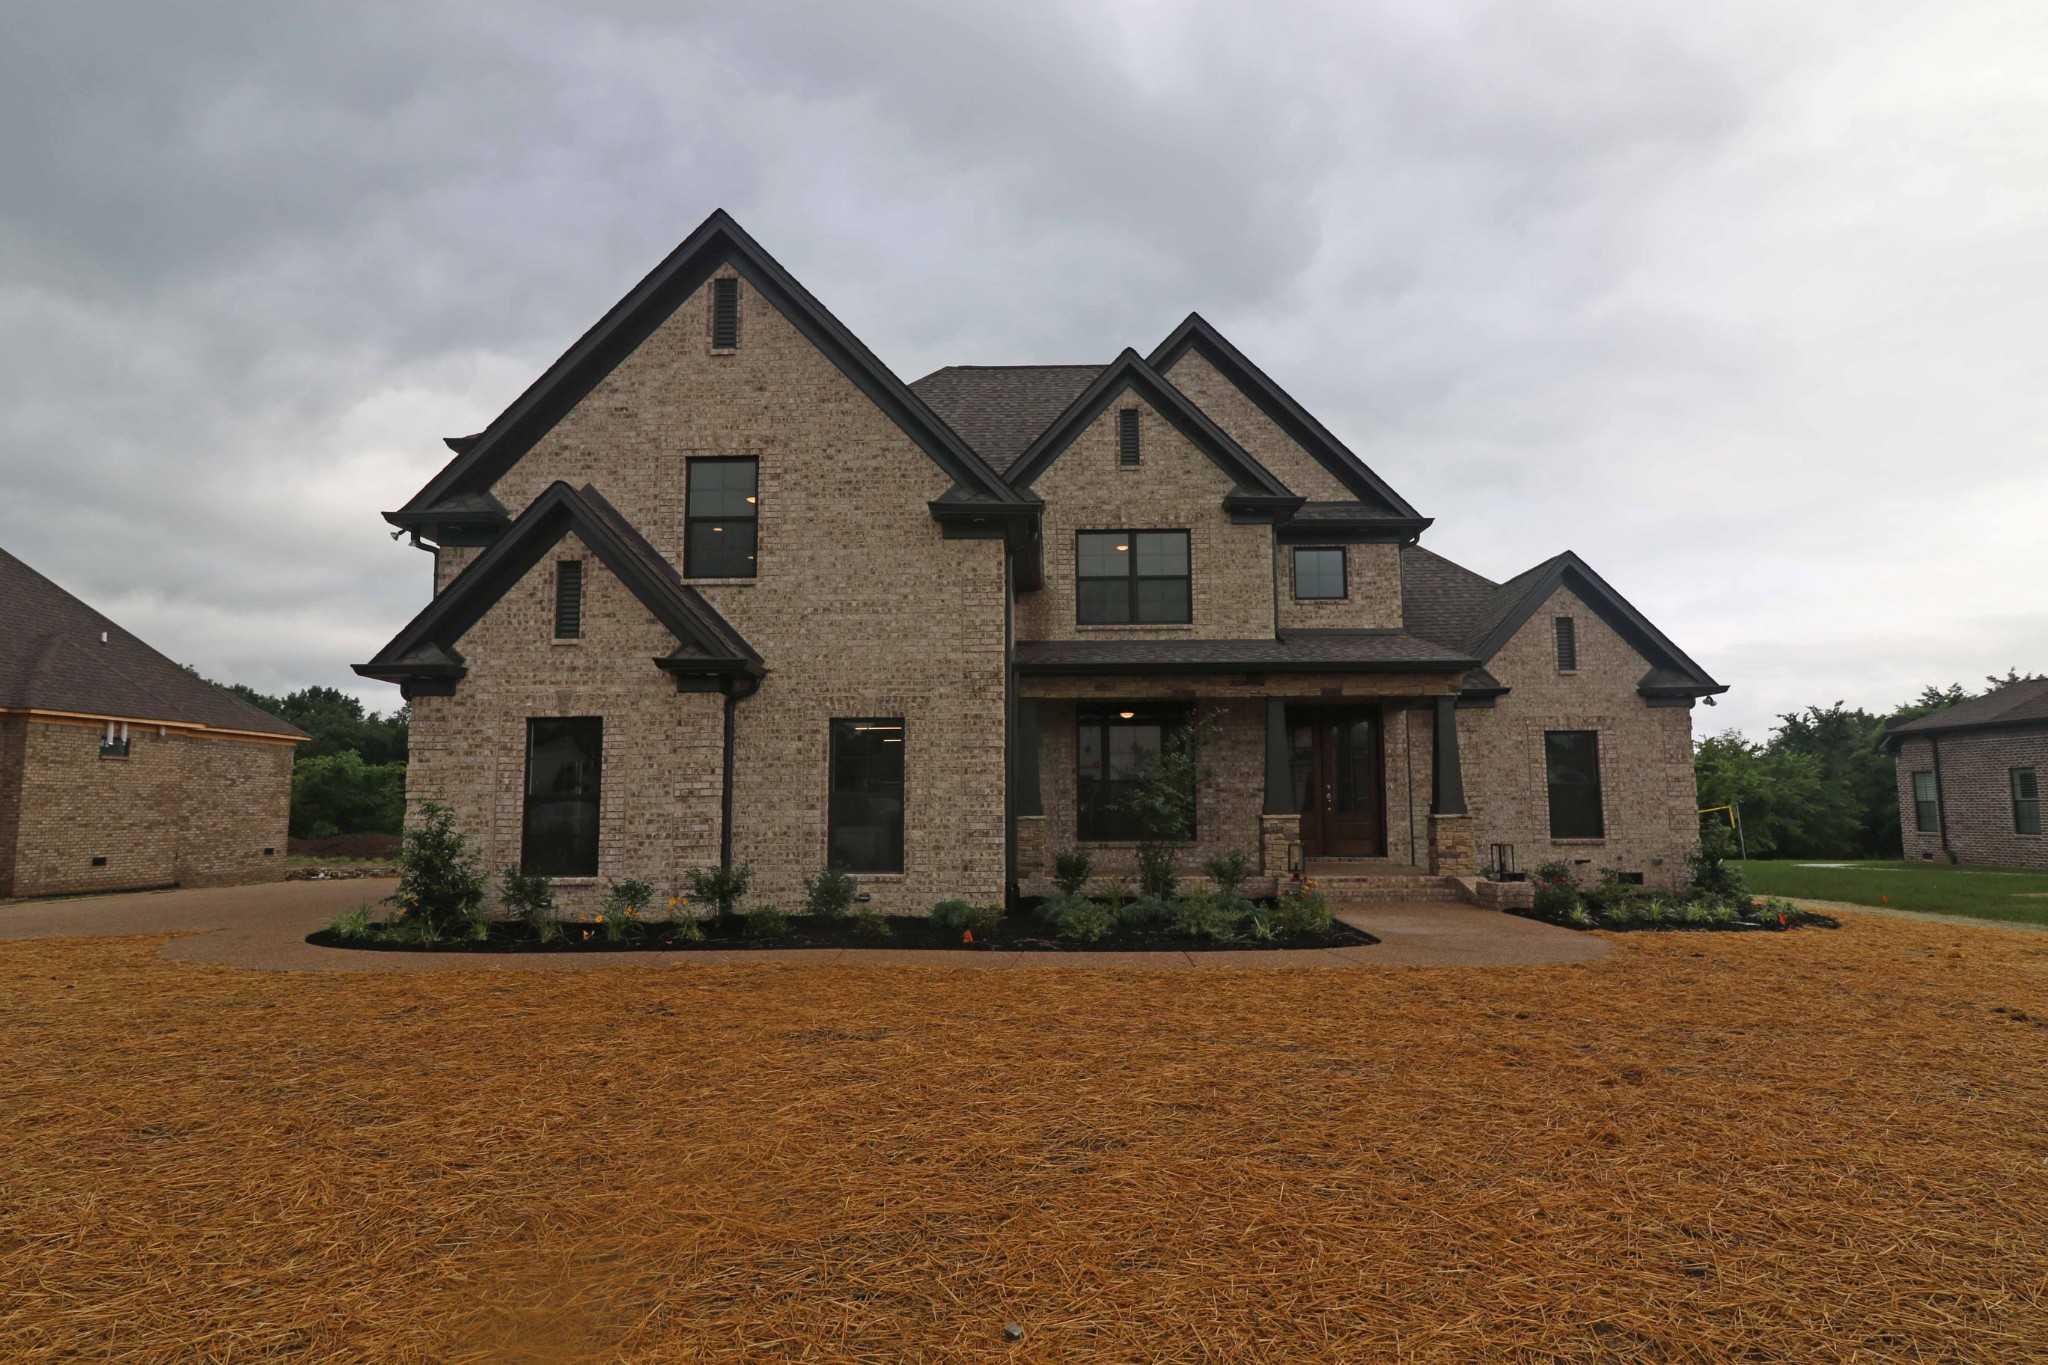 $774,900 - 4Br/4Ba -  for Sale in Wright Farms Sec. 5b, Mount Juliet